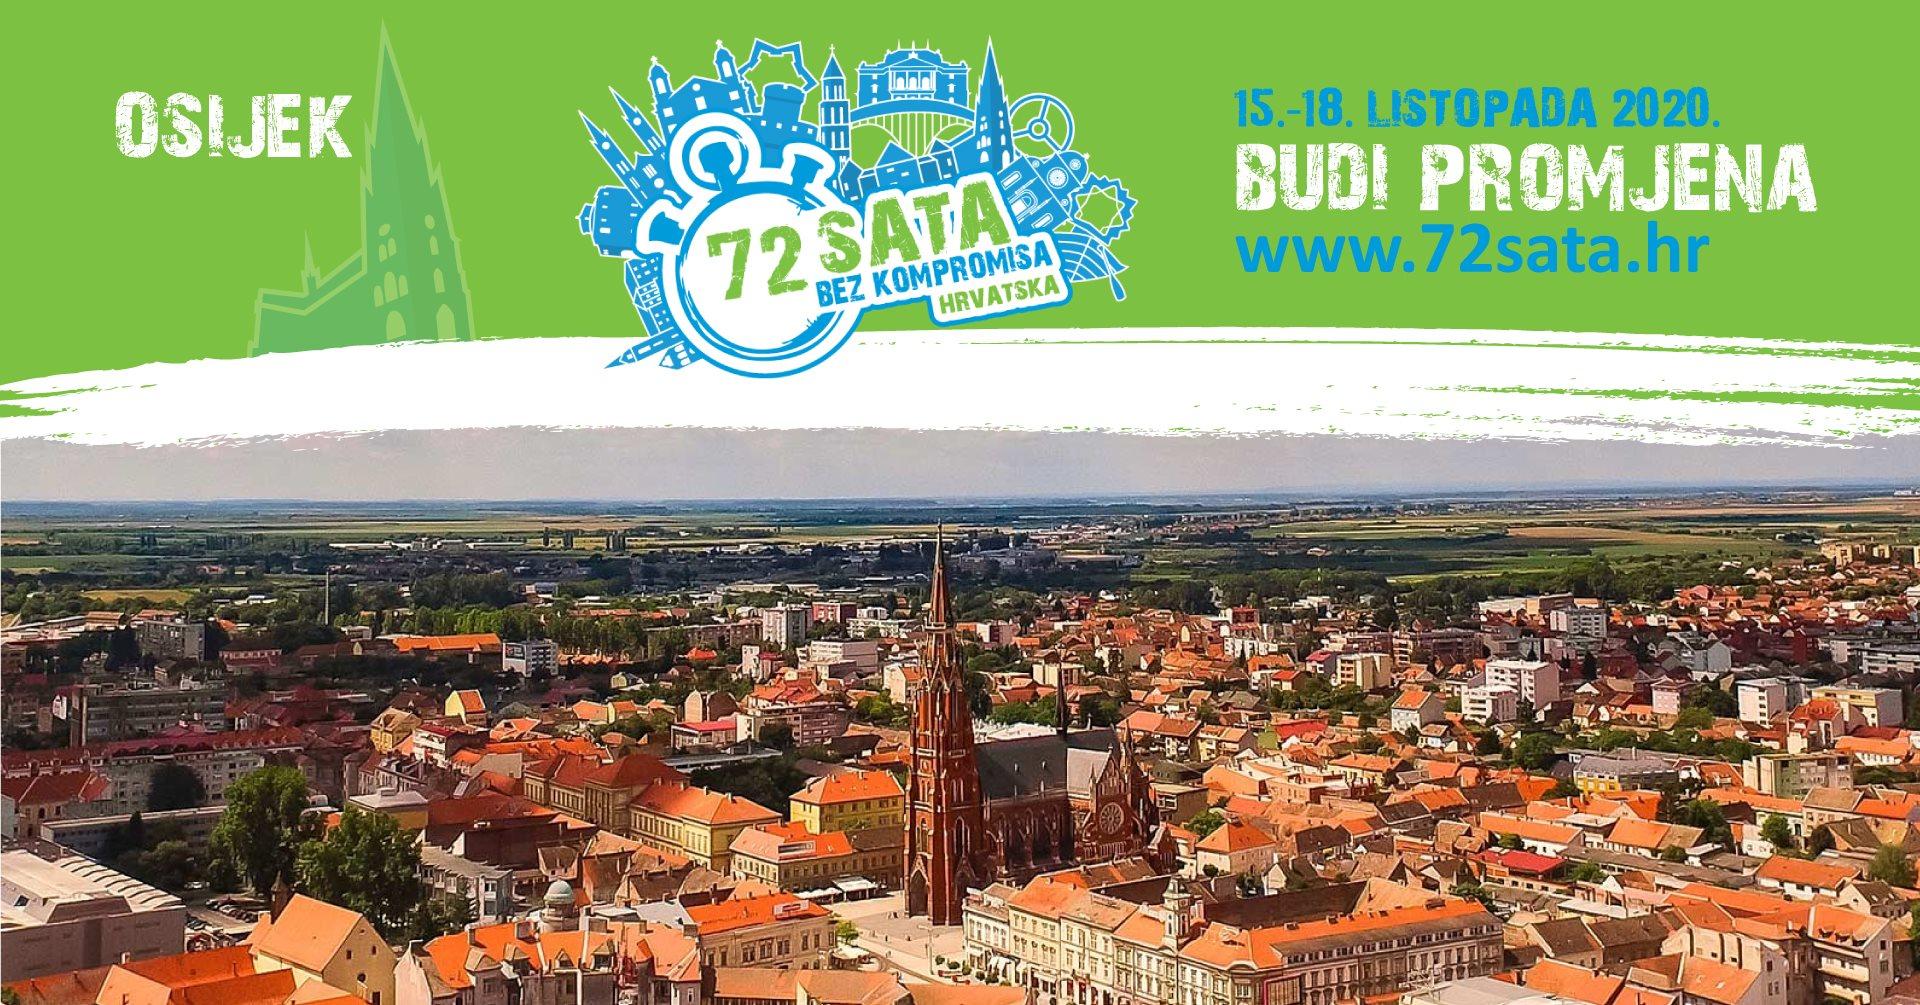 72 sata bez kompromisa - Osijek 2020.